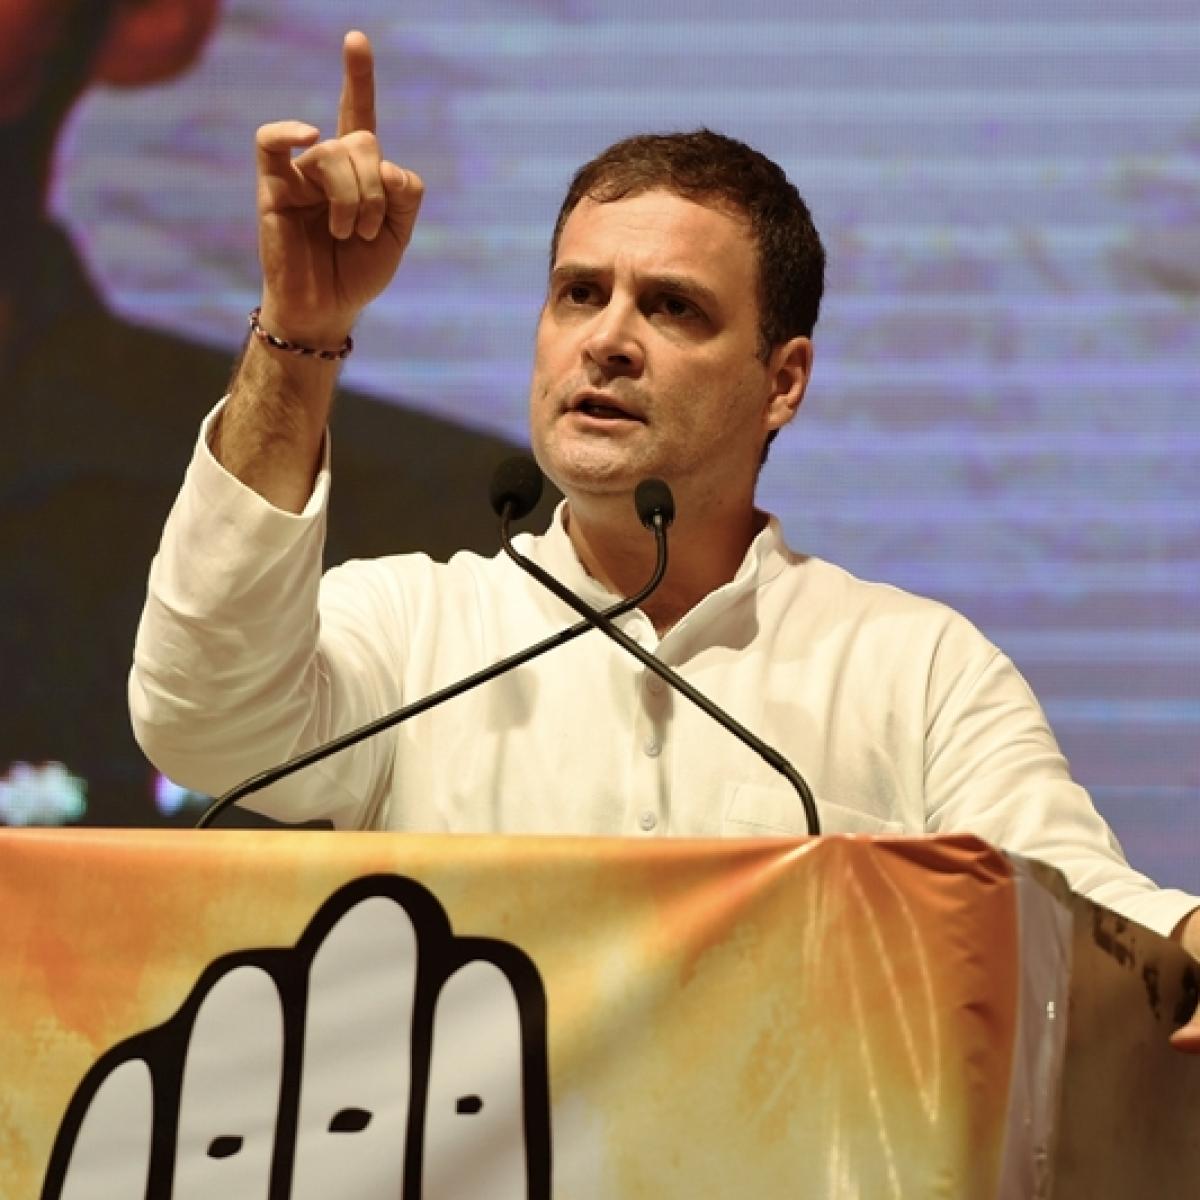 'Guilt in BJP leaders mind for making mistakes': Rahul Gandhi invokes Rafale at Mumbai rally